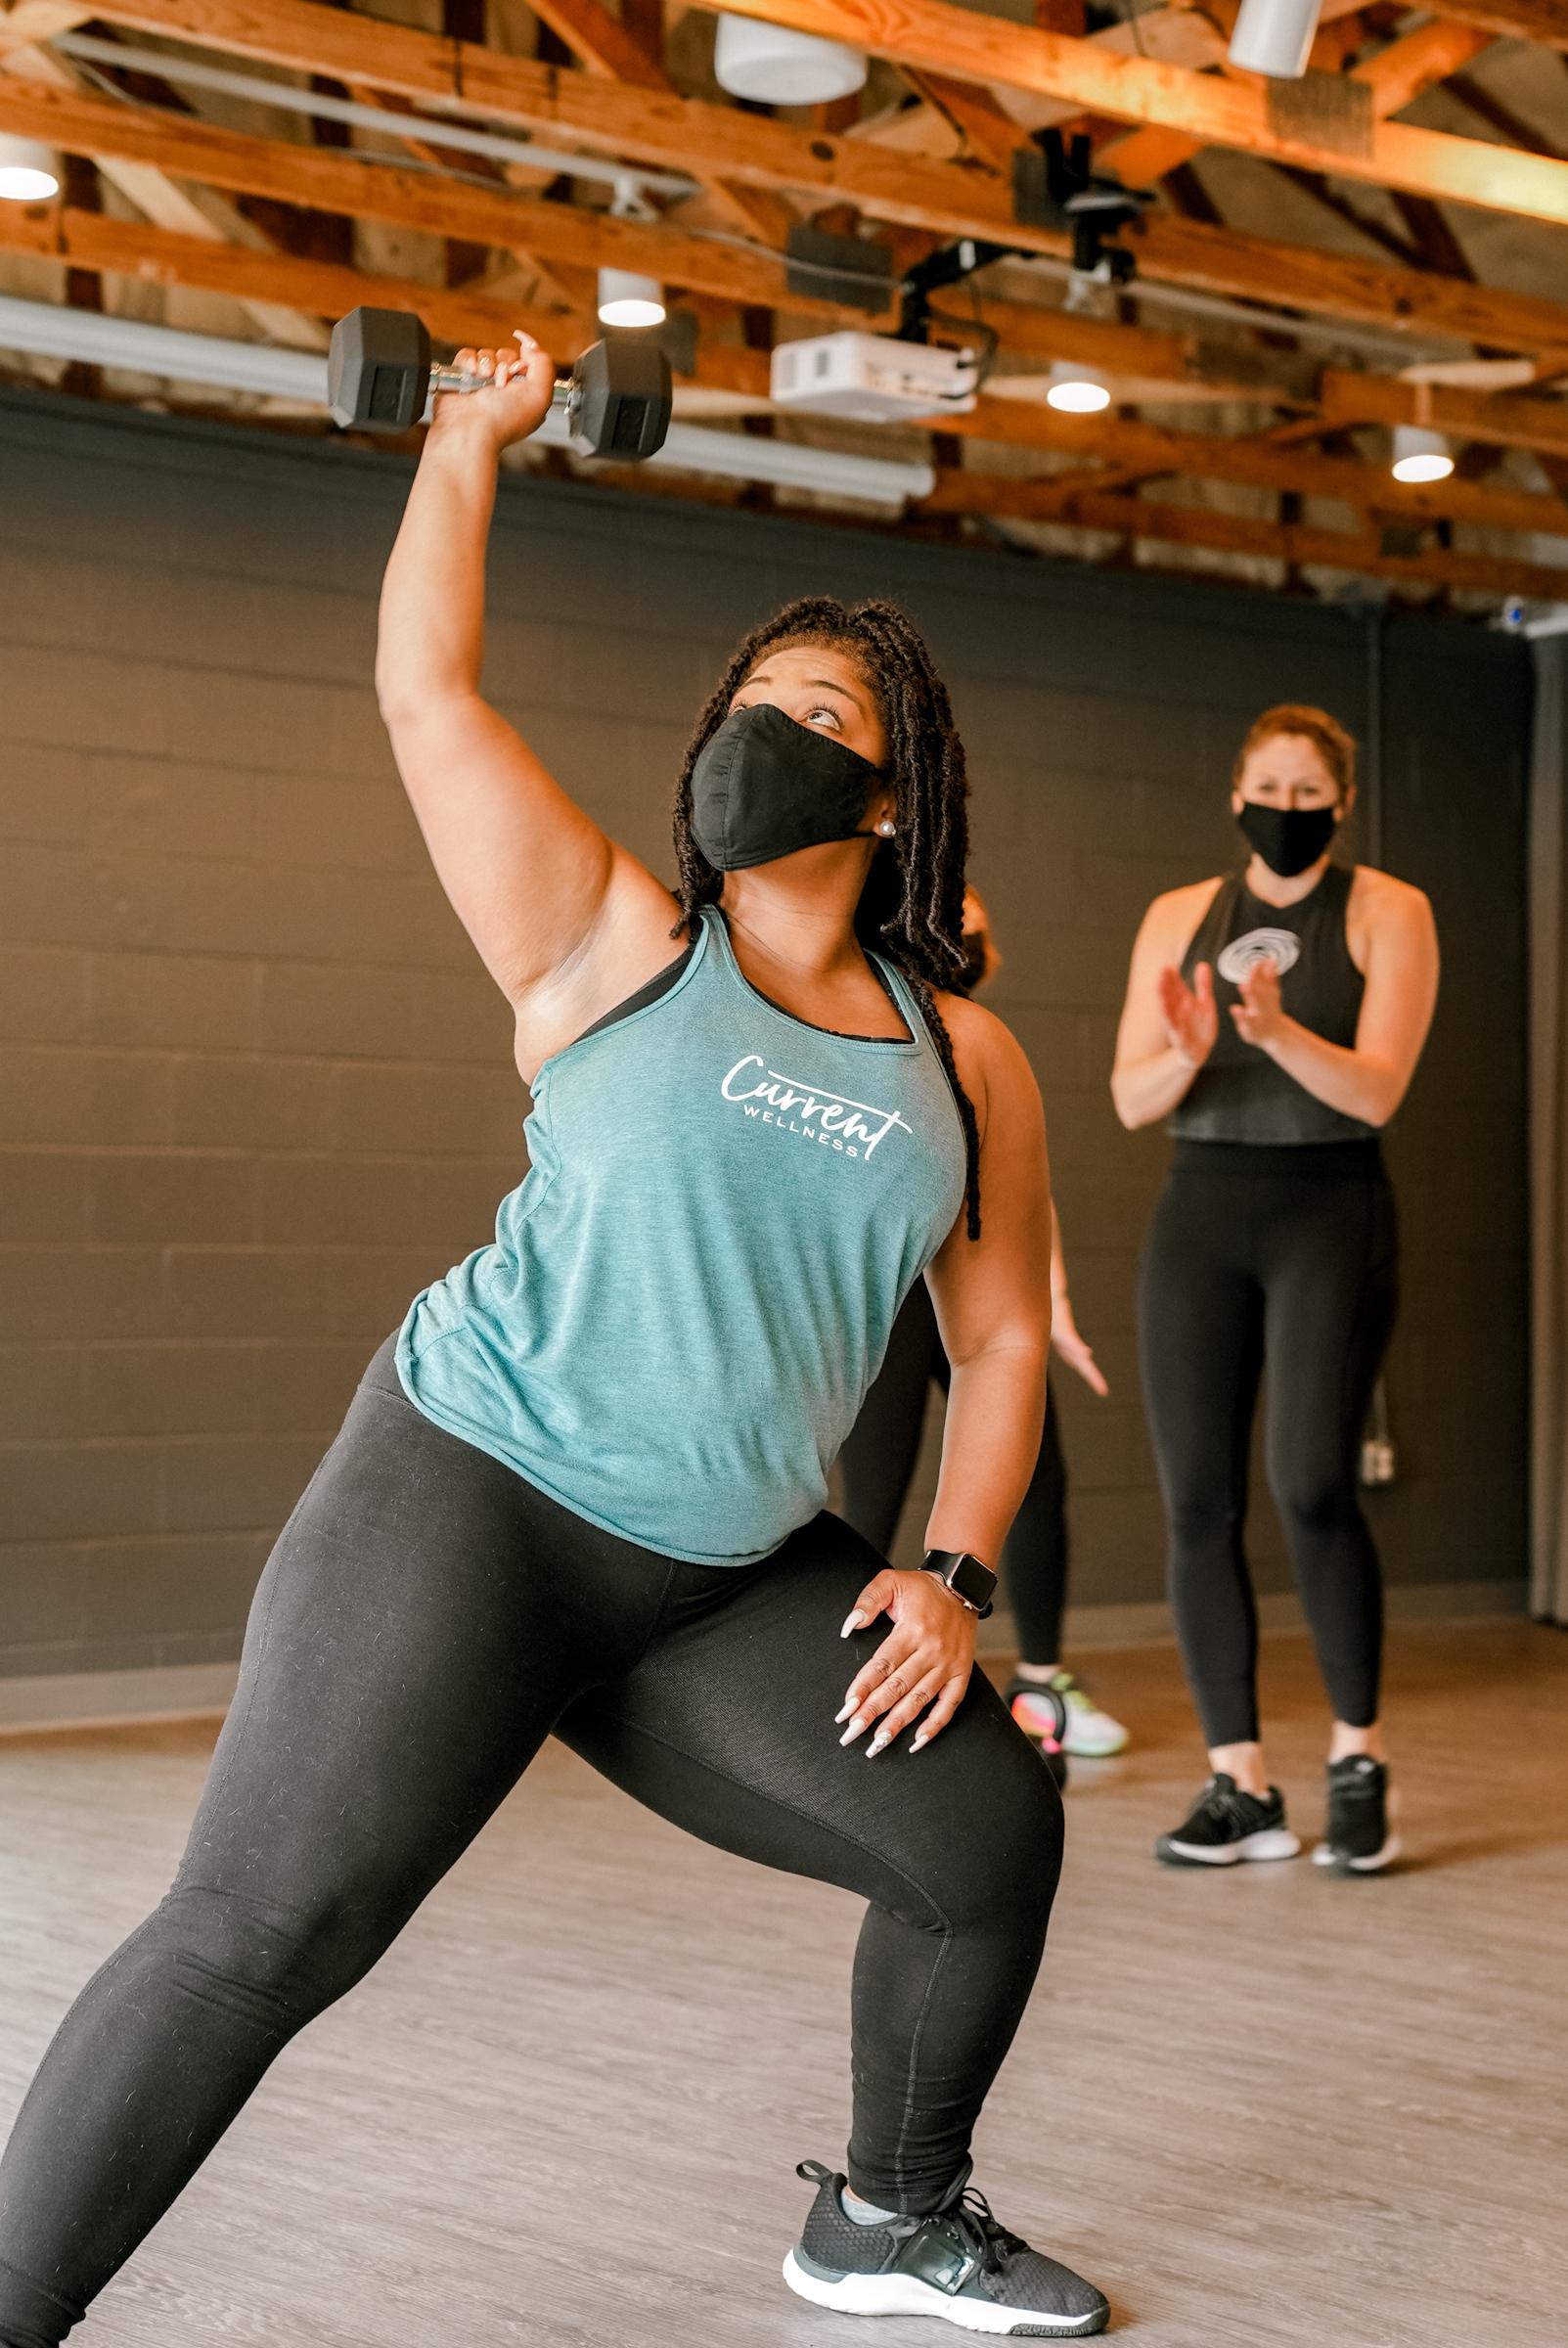 Current-Wellness-Fitness-Classes-30 (1)